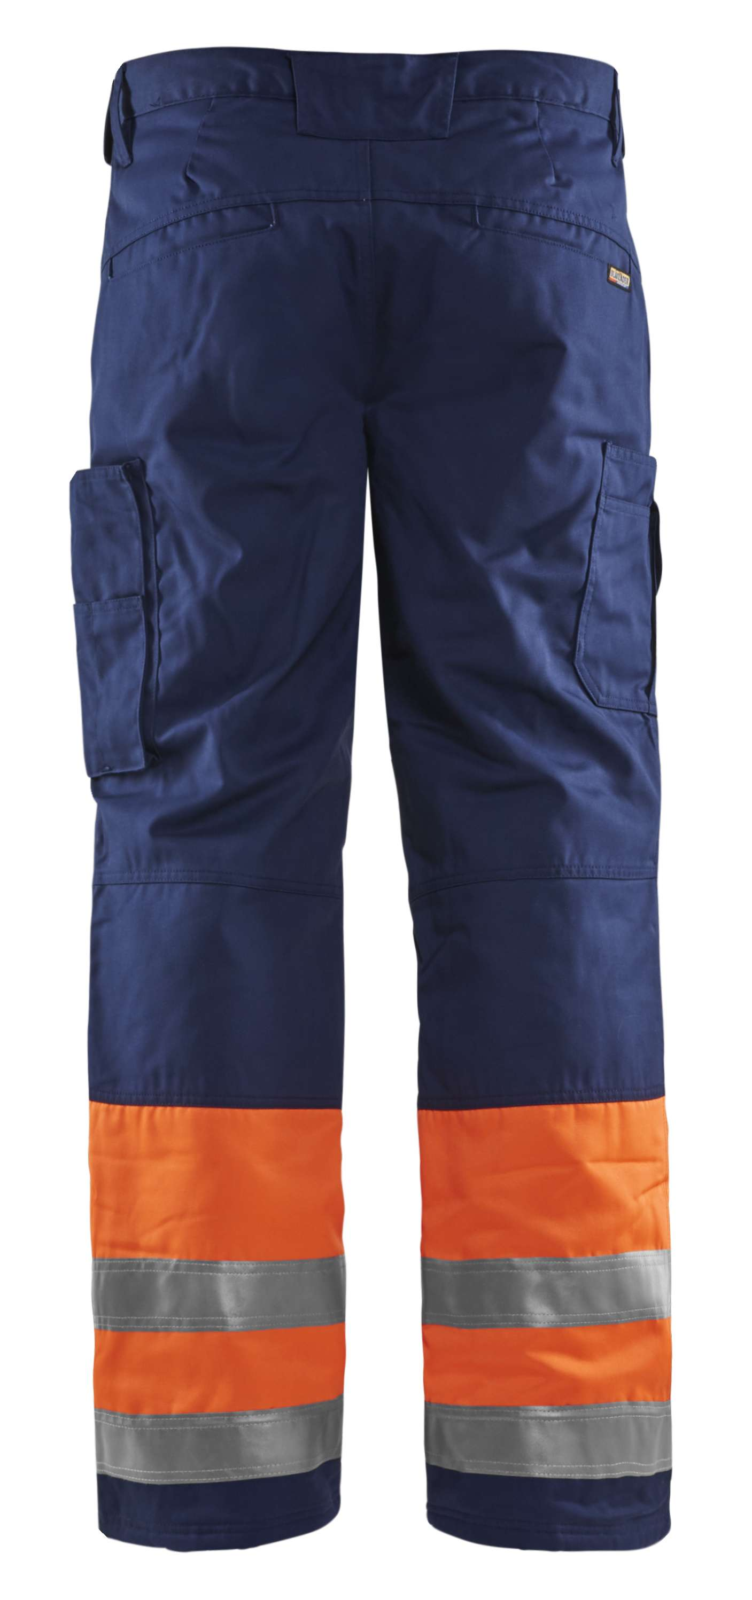 Blaklader Winterbroeken 18621811 High Vis oranje-marineblauw(5389)